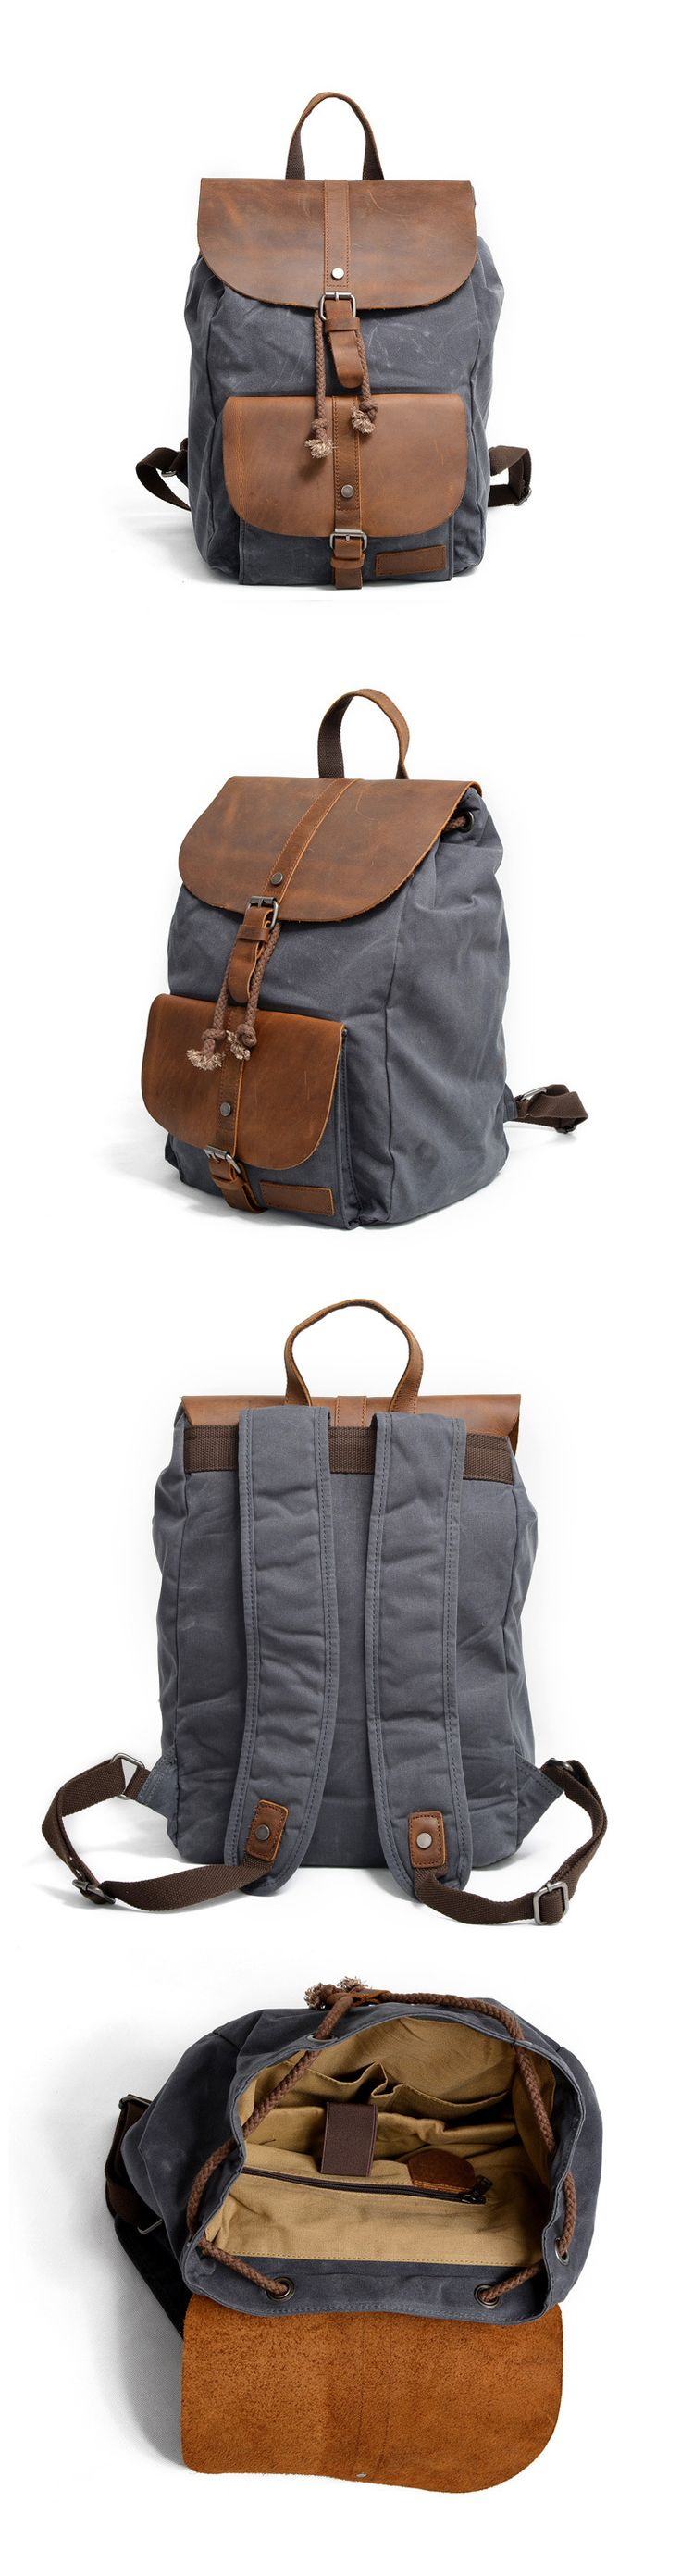 Waxed Canvas Leather Backpack Rucksack School Backpack Travel Backpack